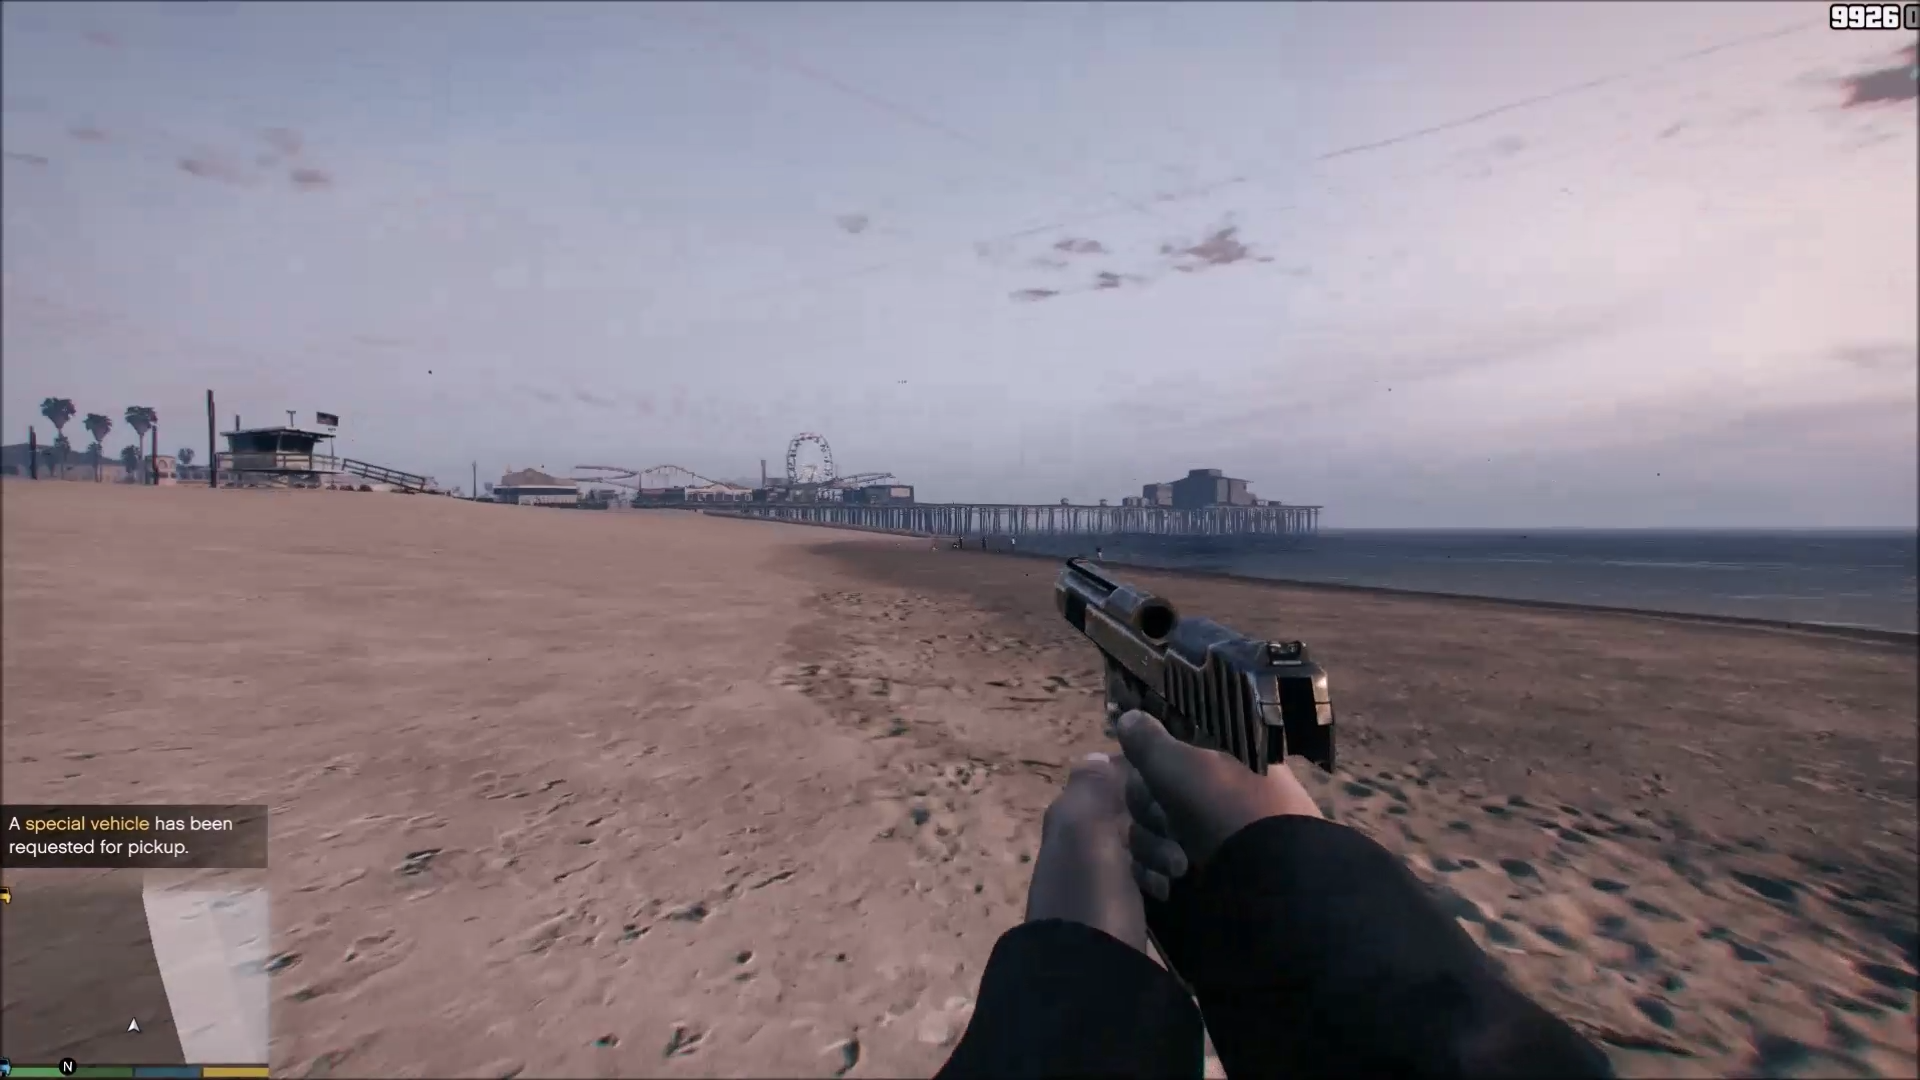 MW2 Desert Eagle Sound + Realistic Performance - GTA5-Mods com